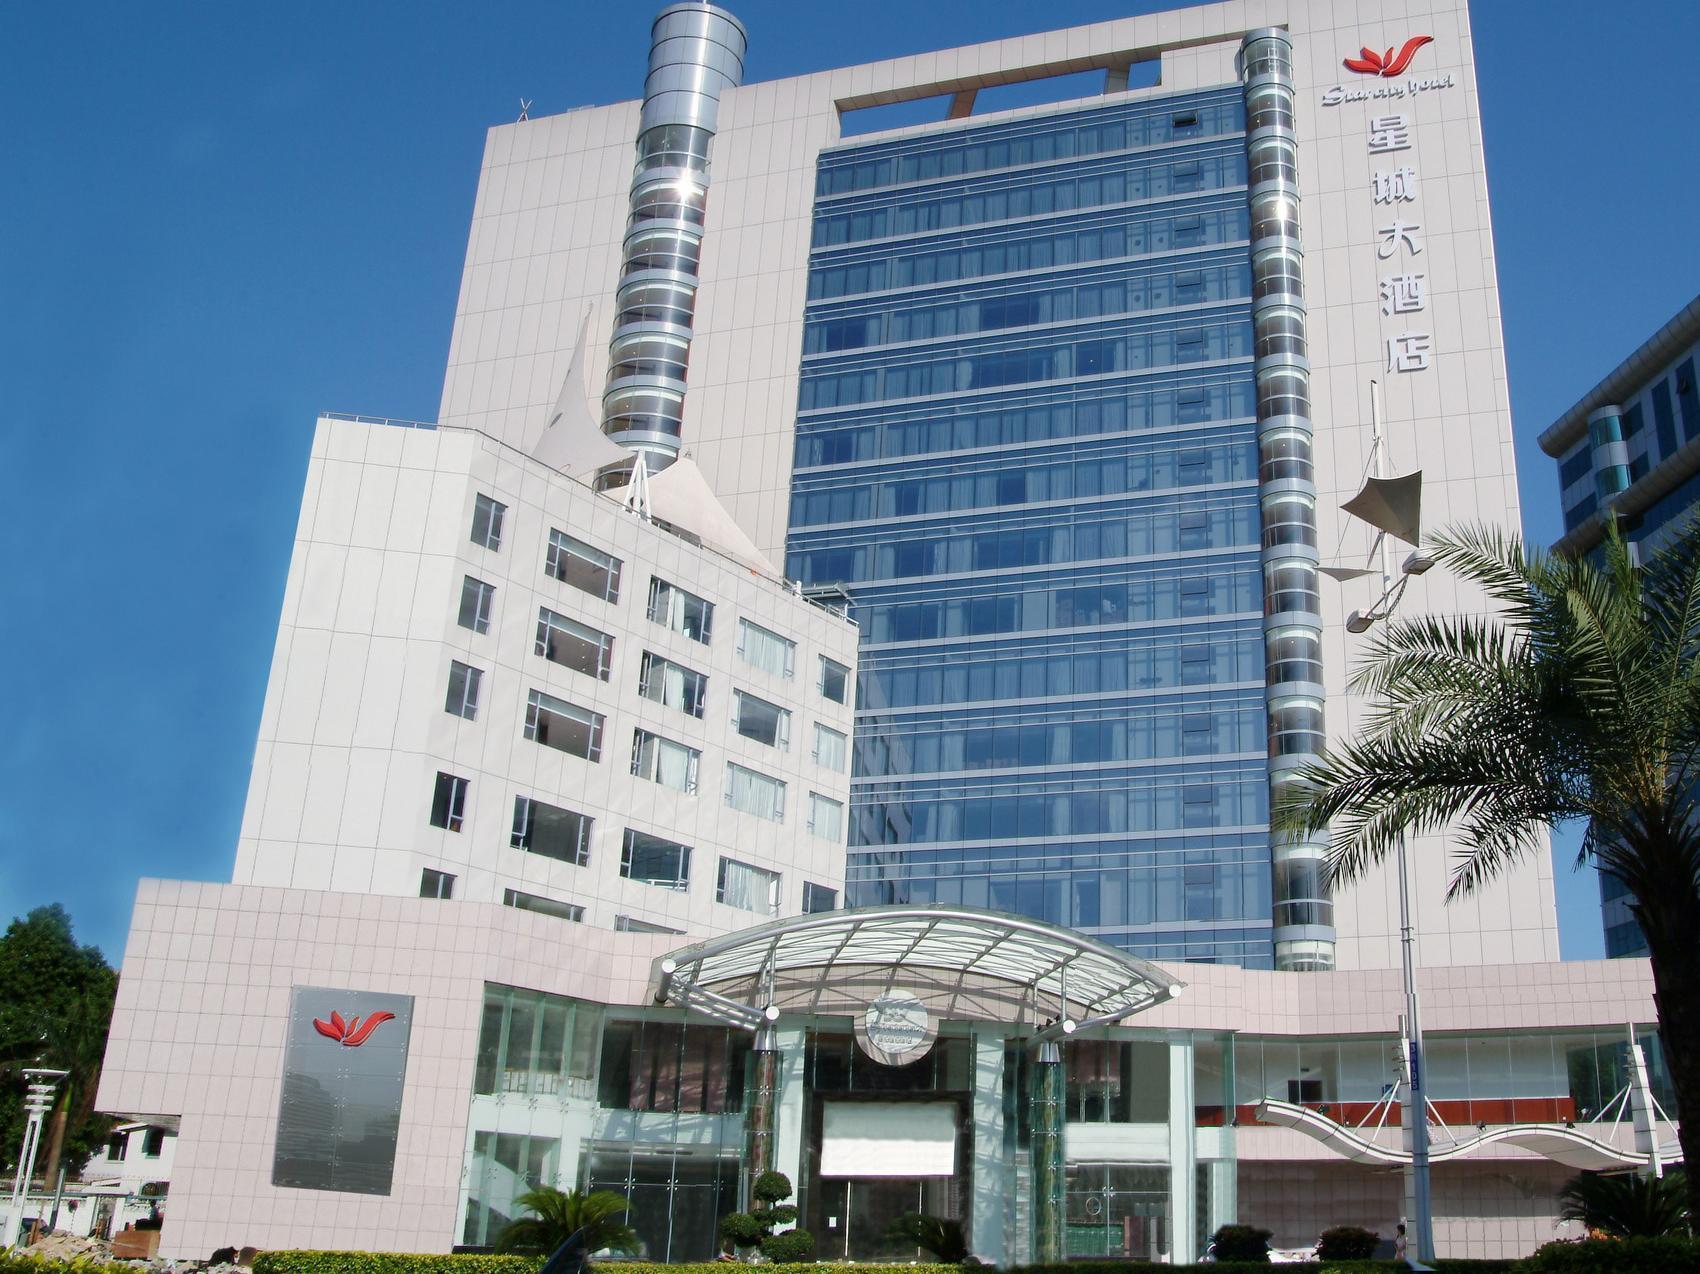 Star City Hotel Zhuhai Reviews